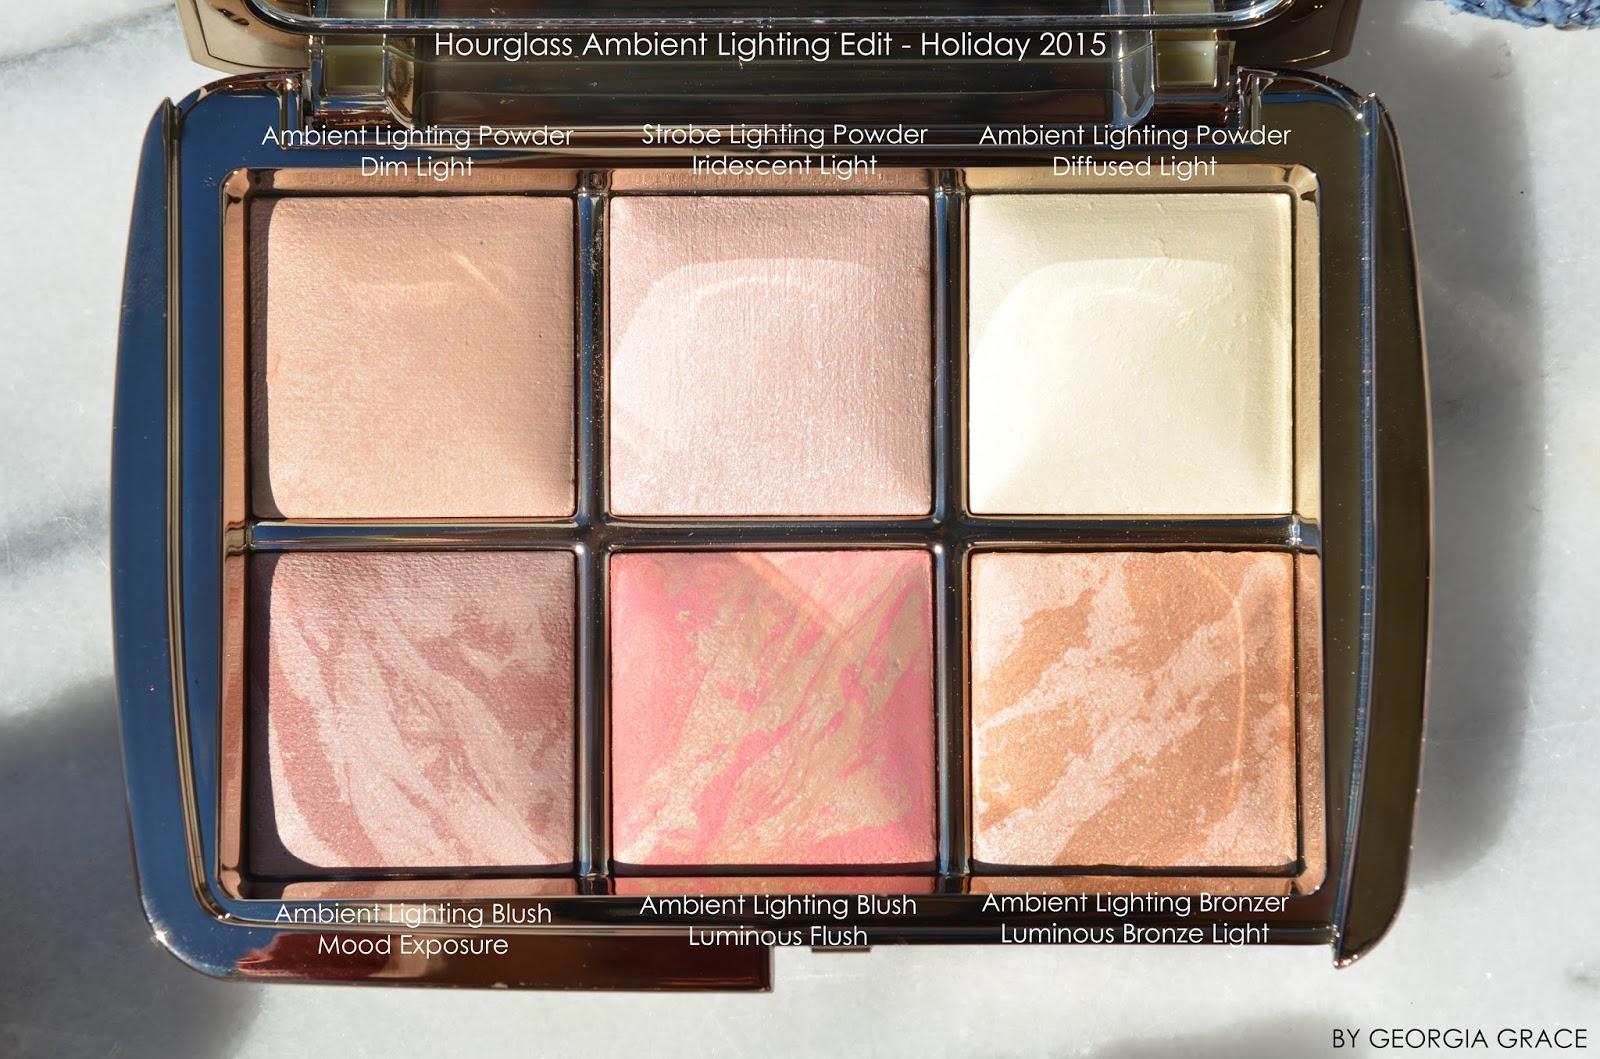 ambient lighting edit 4 hourglass